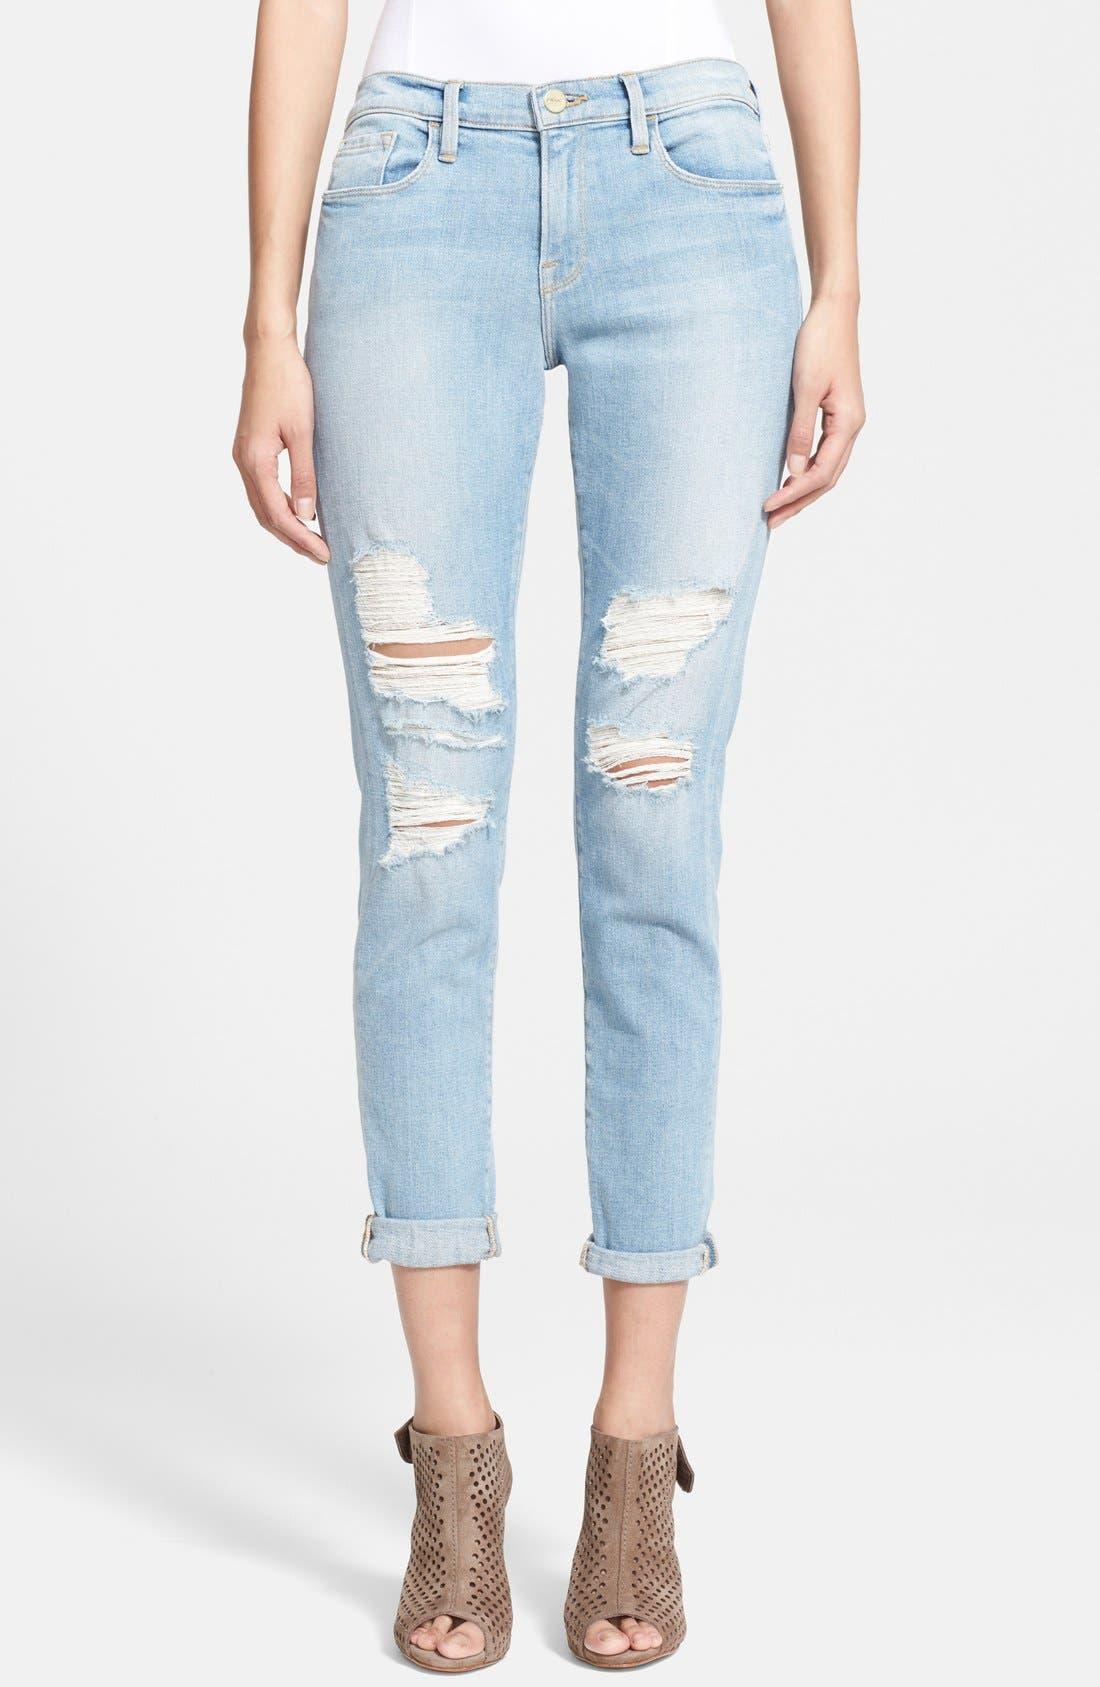 Alternate Image 1 Selected - Frame Denim 'Le Garcon' Boyfriend Jeans (Lucielle)